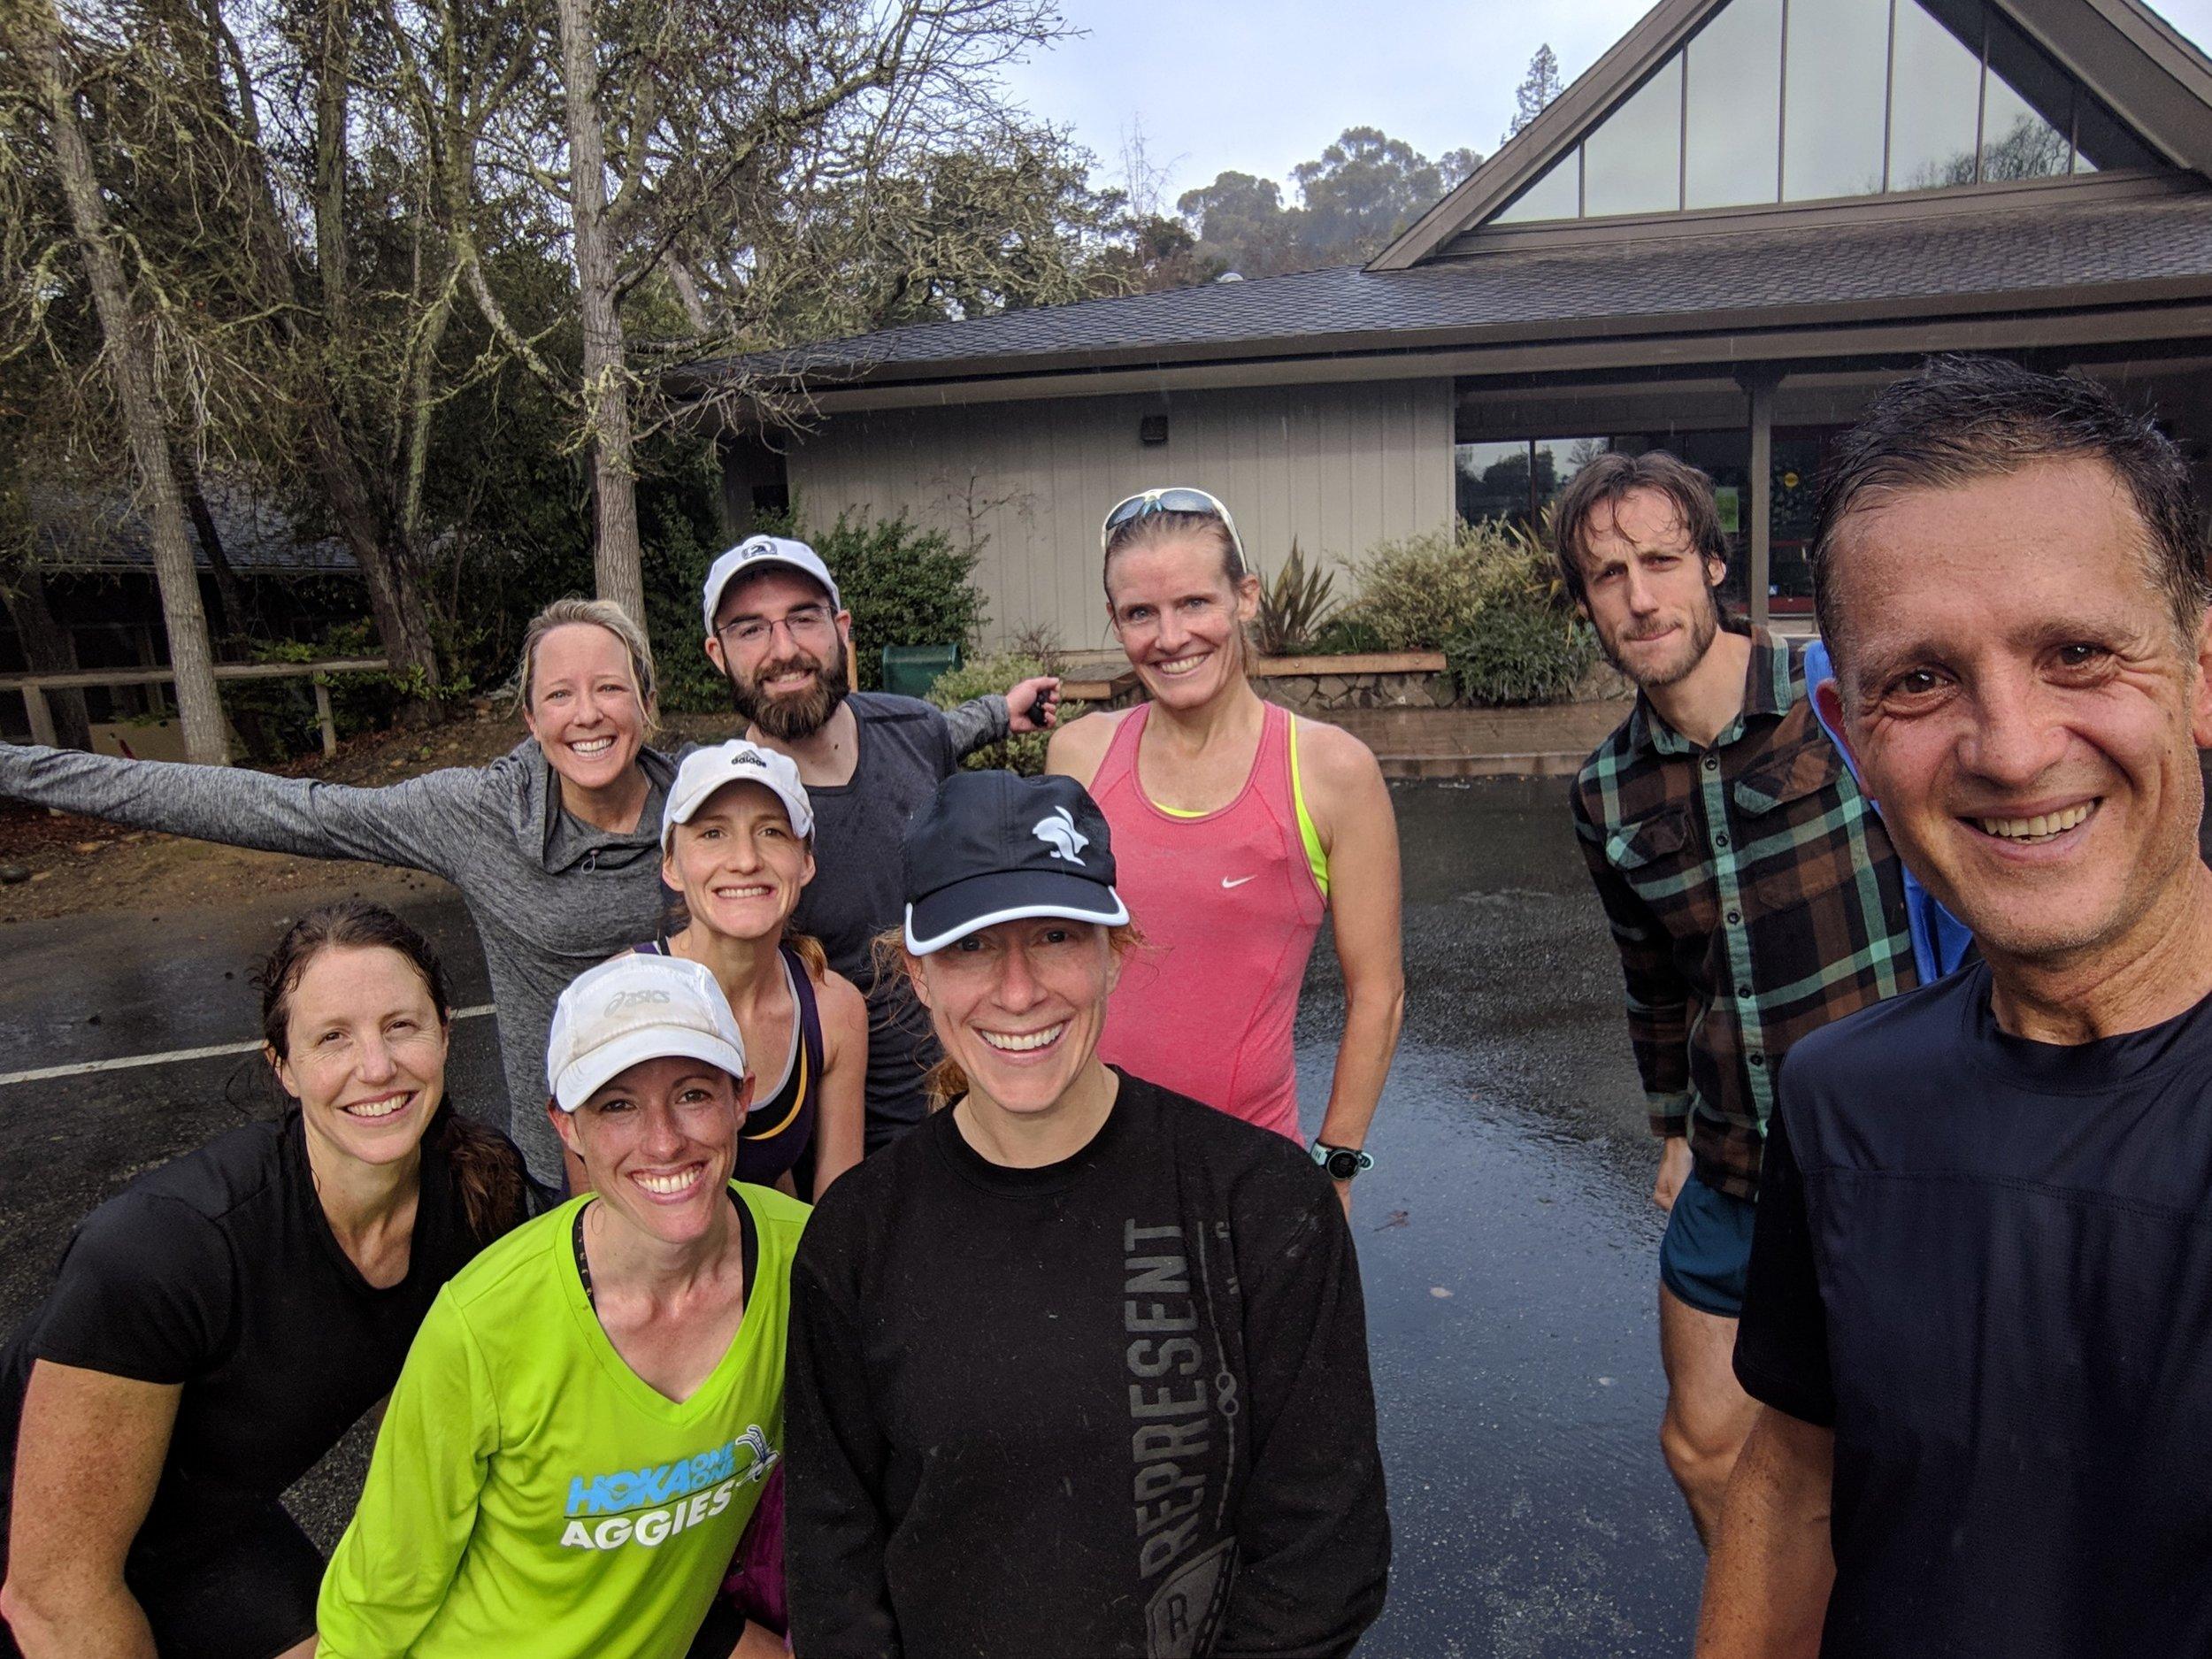 Our long run crew: Teresa, Liza, me, Tom, Emily, Max, Jenna & Teresa's hubby